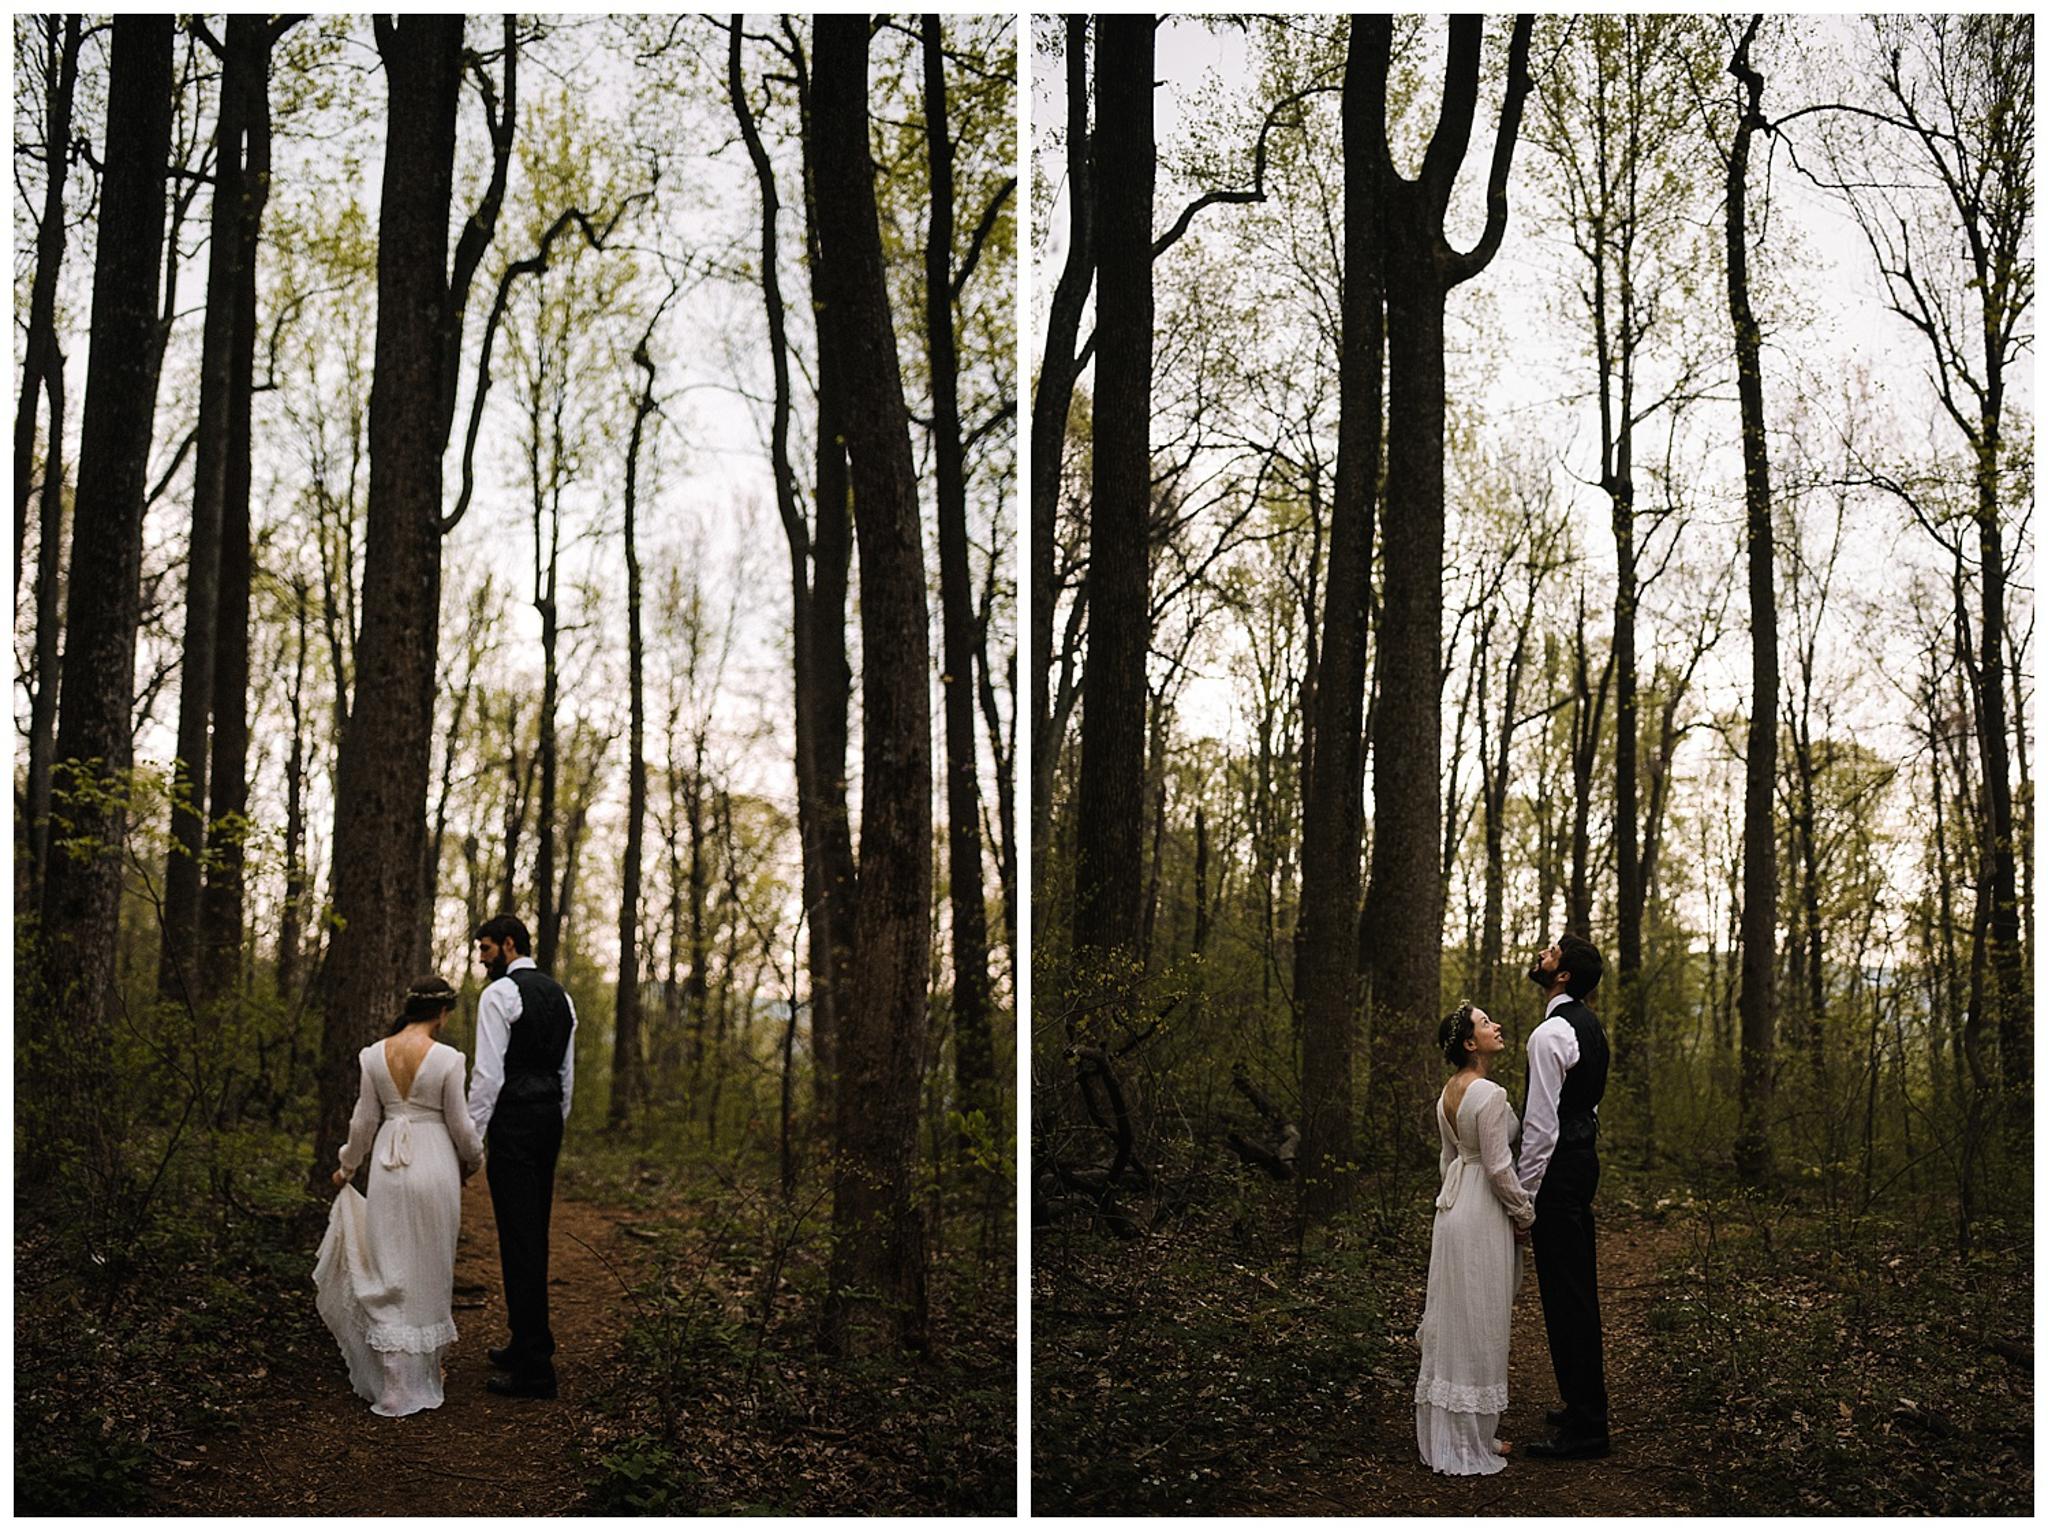 Lisa and Stuart - Post Wedding Couple Portraits - White Sails Creative - Blue Ridge Mountains - Sunrise Shenandoah National Park_54.JPG